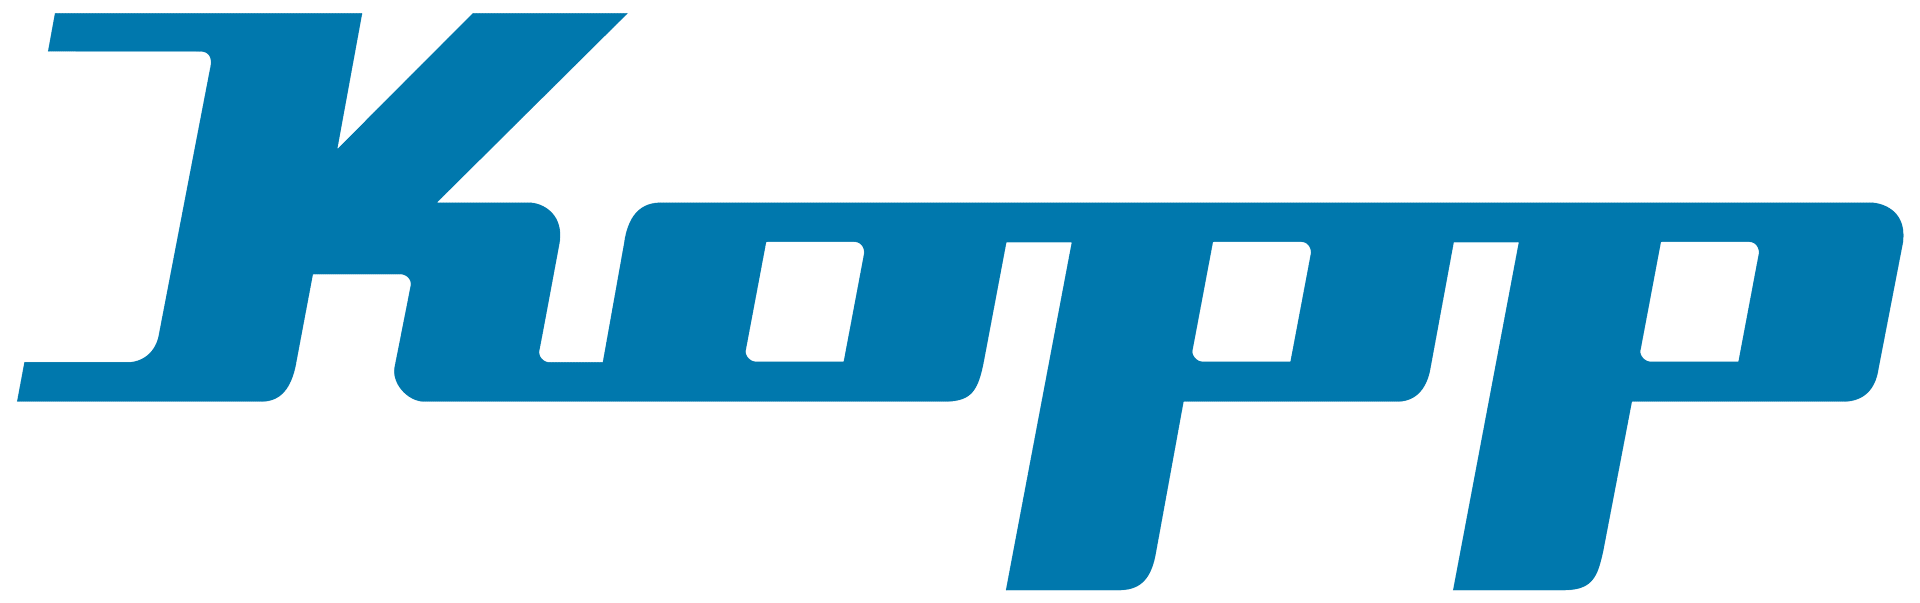 kopp-logo-diy-2